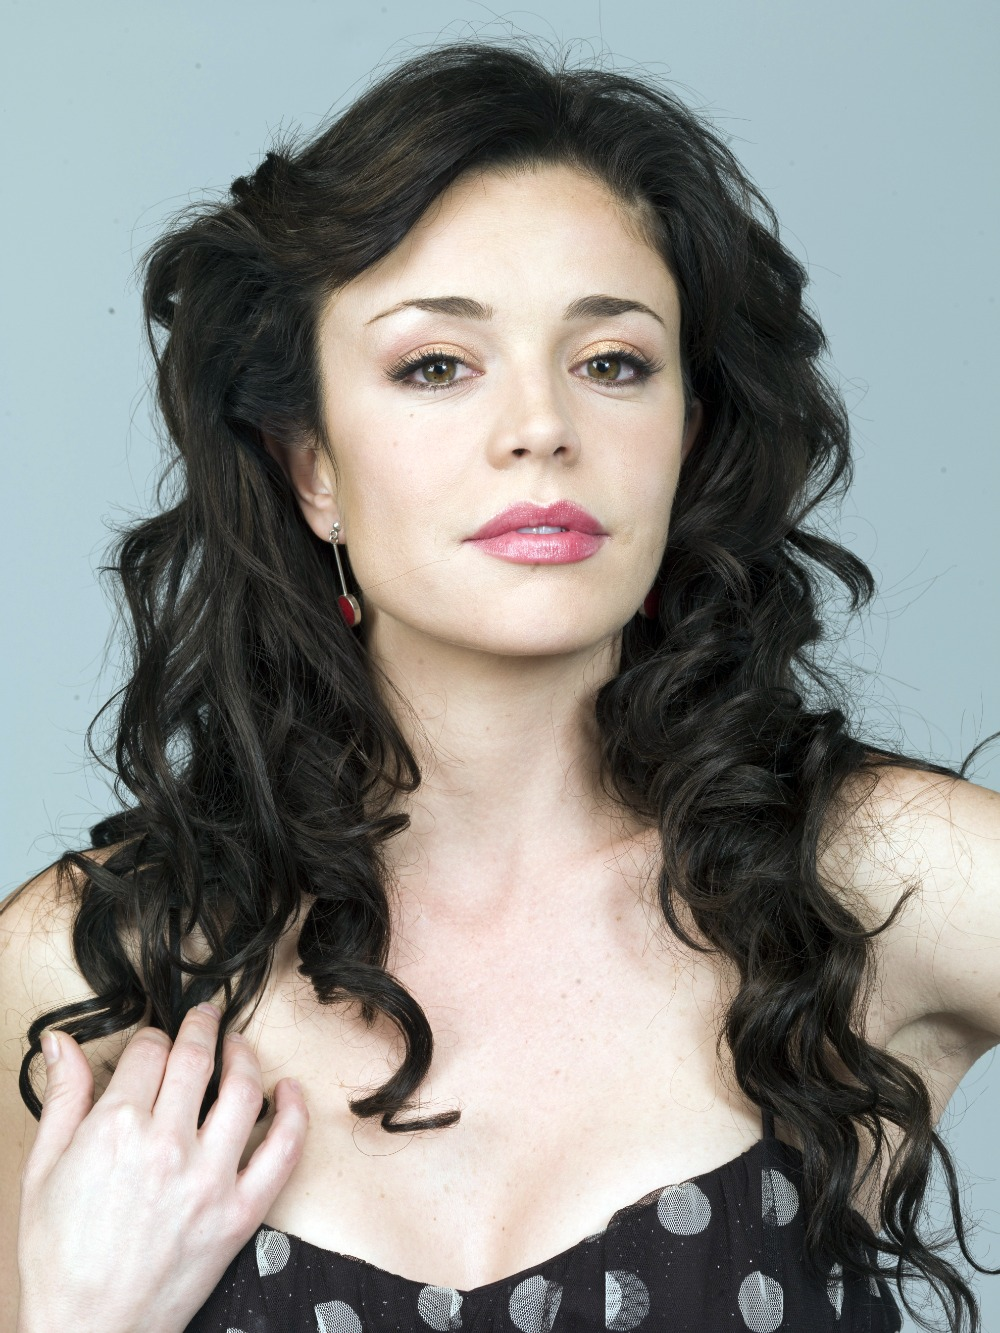 Flora Martinez nudes (24 photo), Ass, Sideboobs, Twitter, lingerie 2018